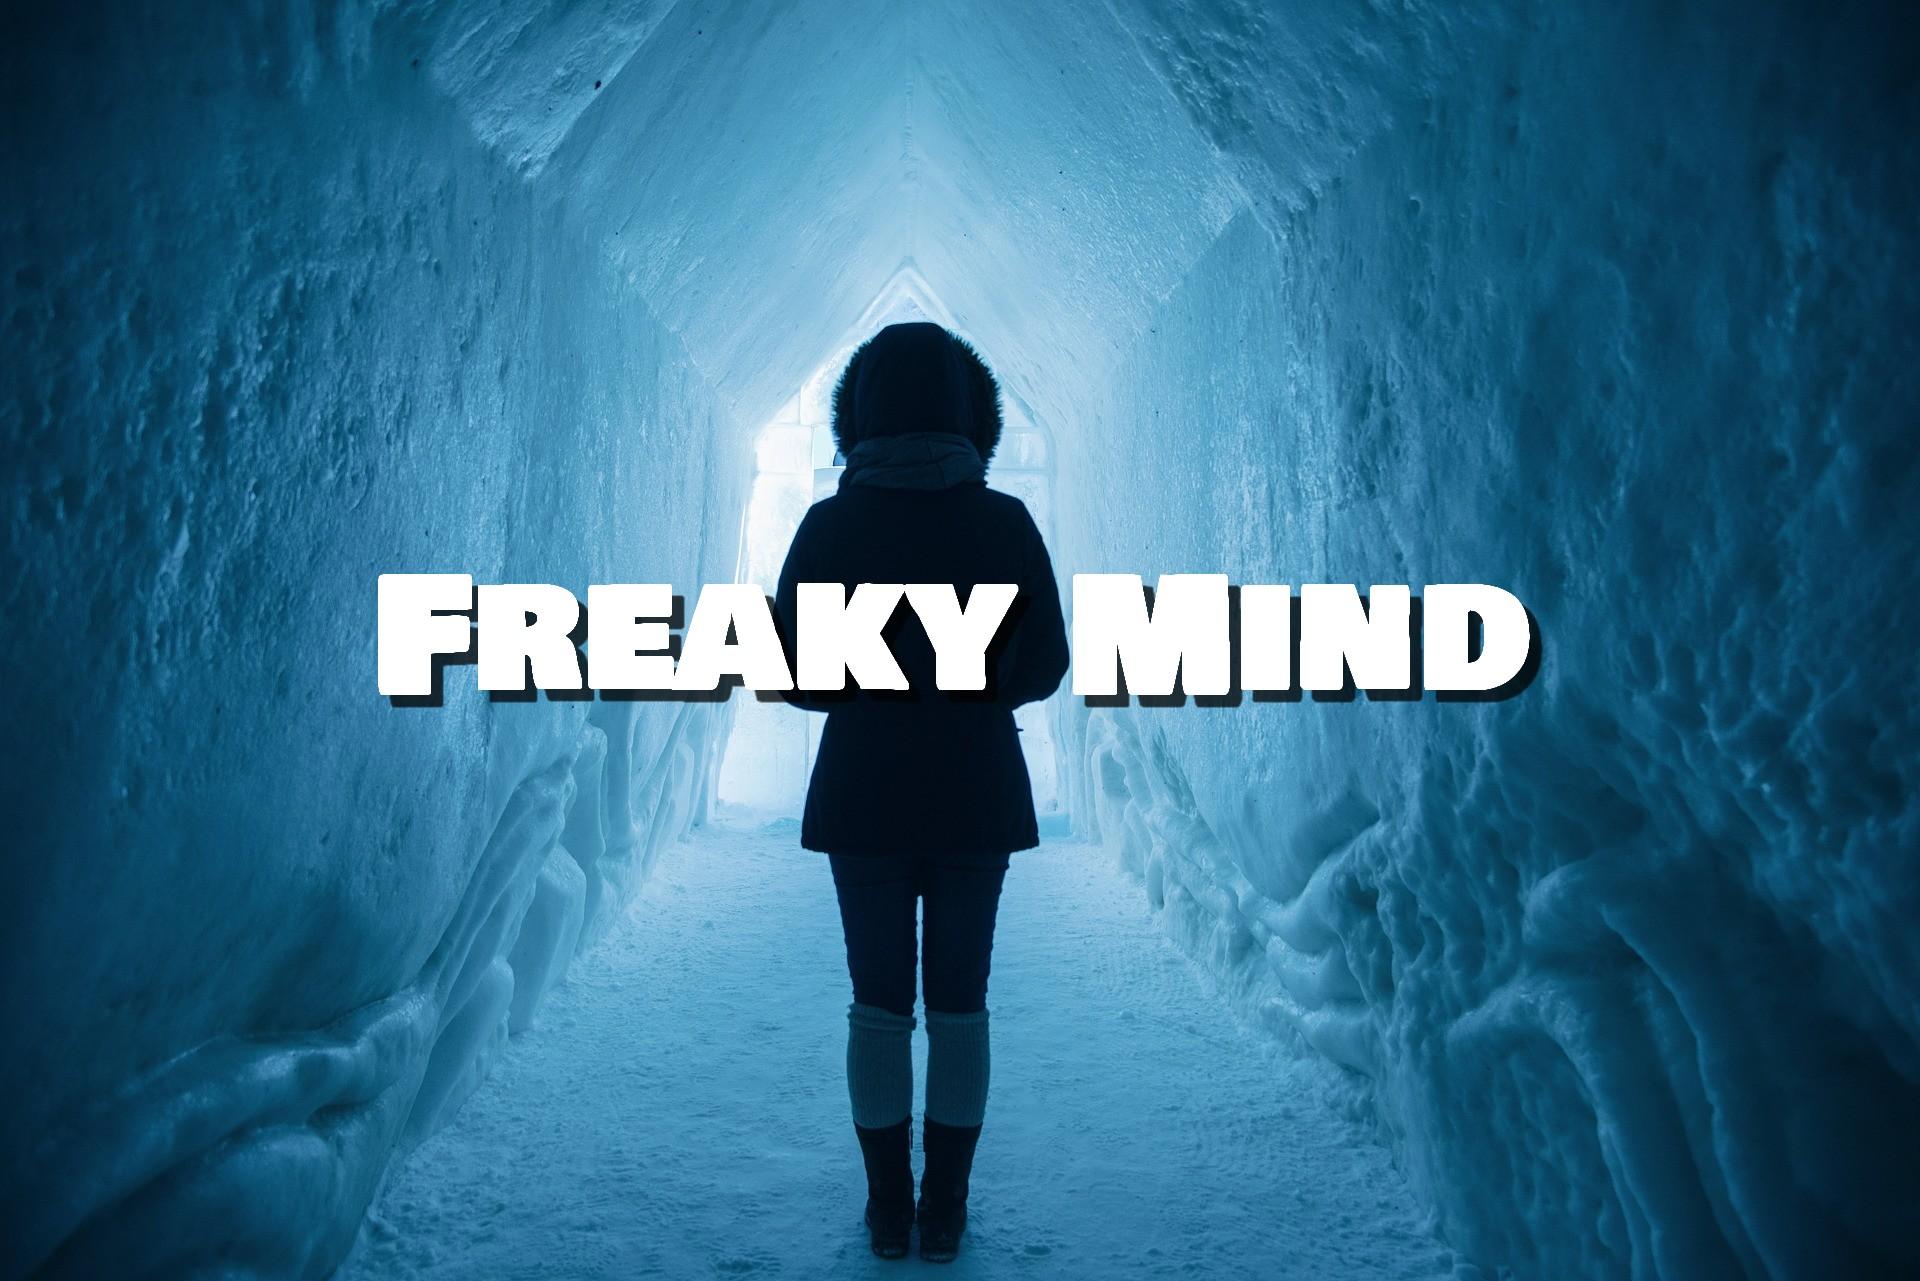 Freaky mind